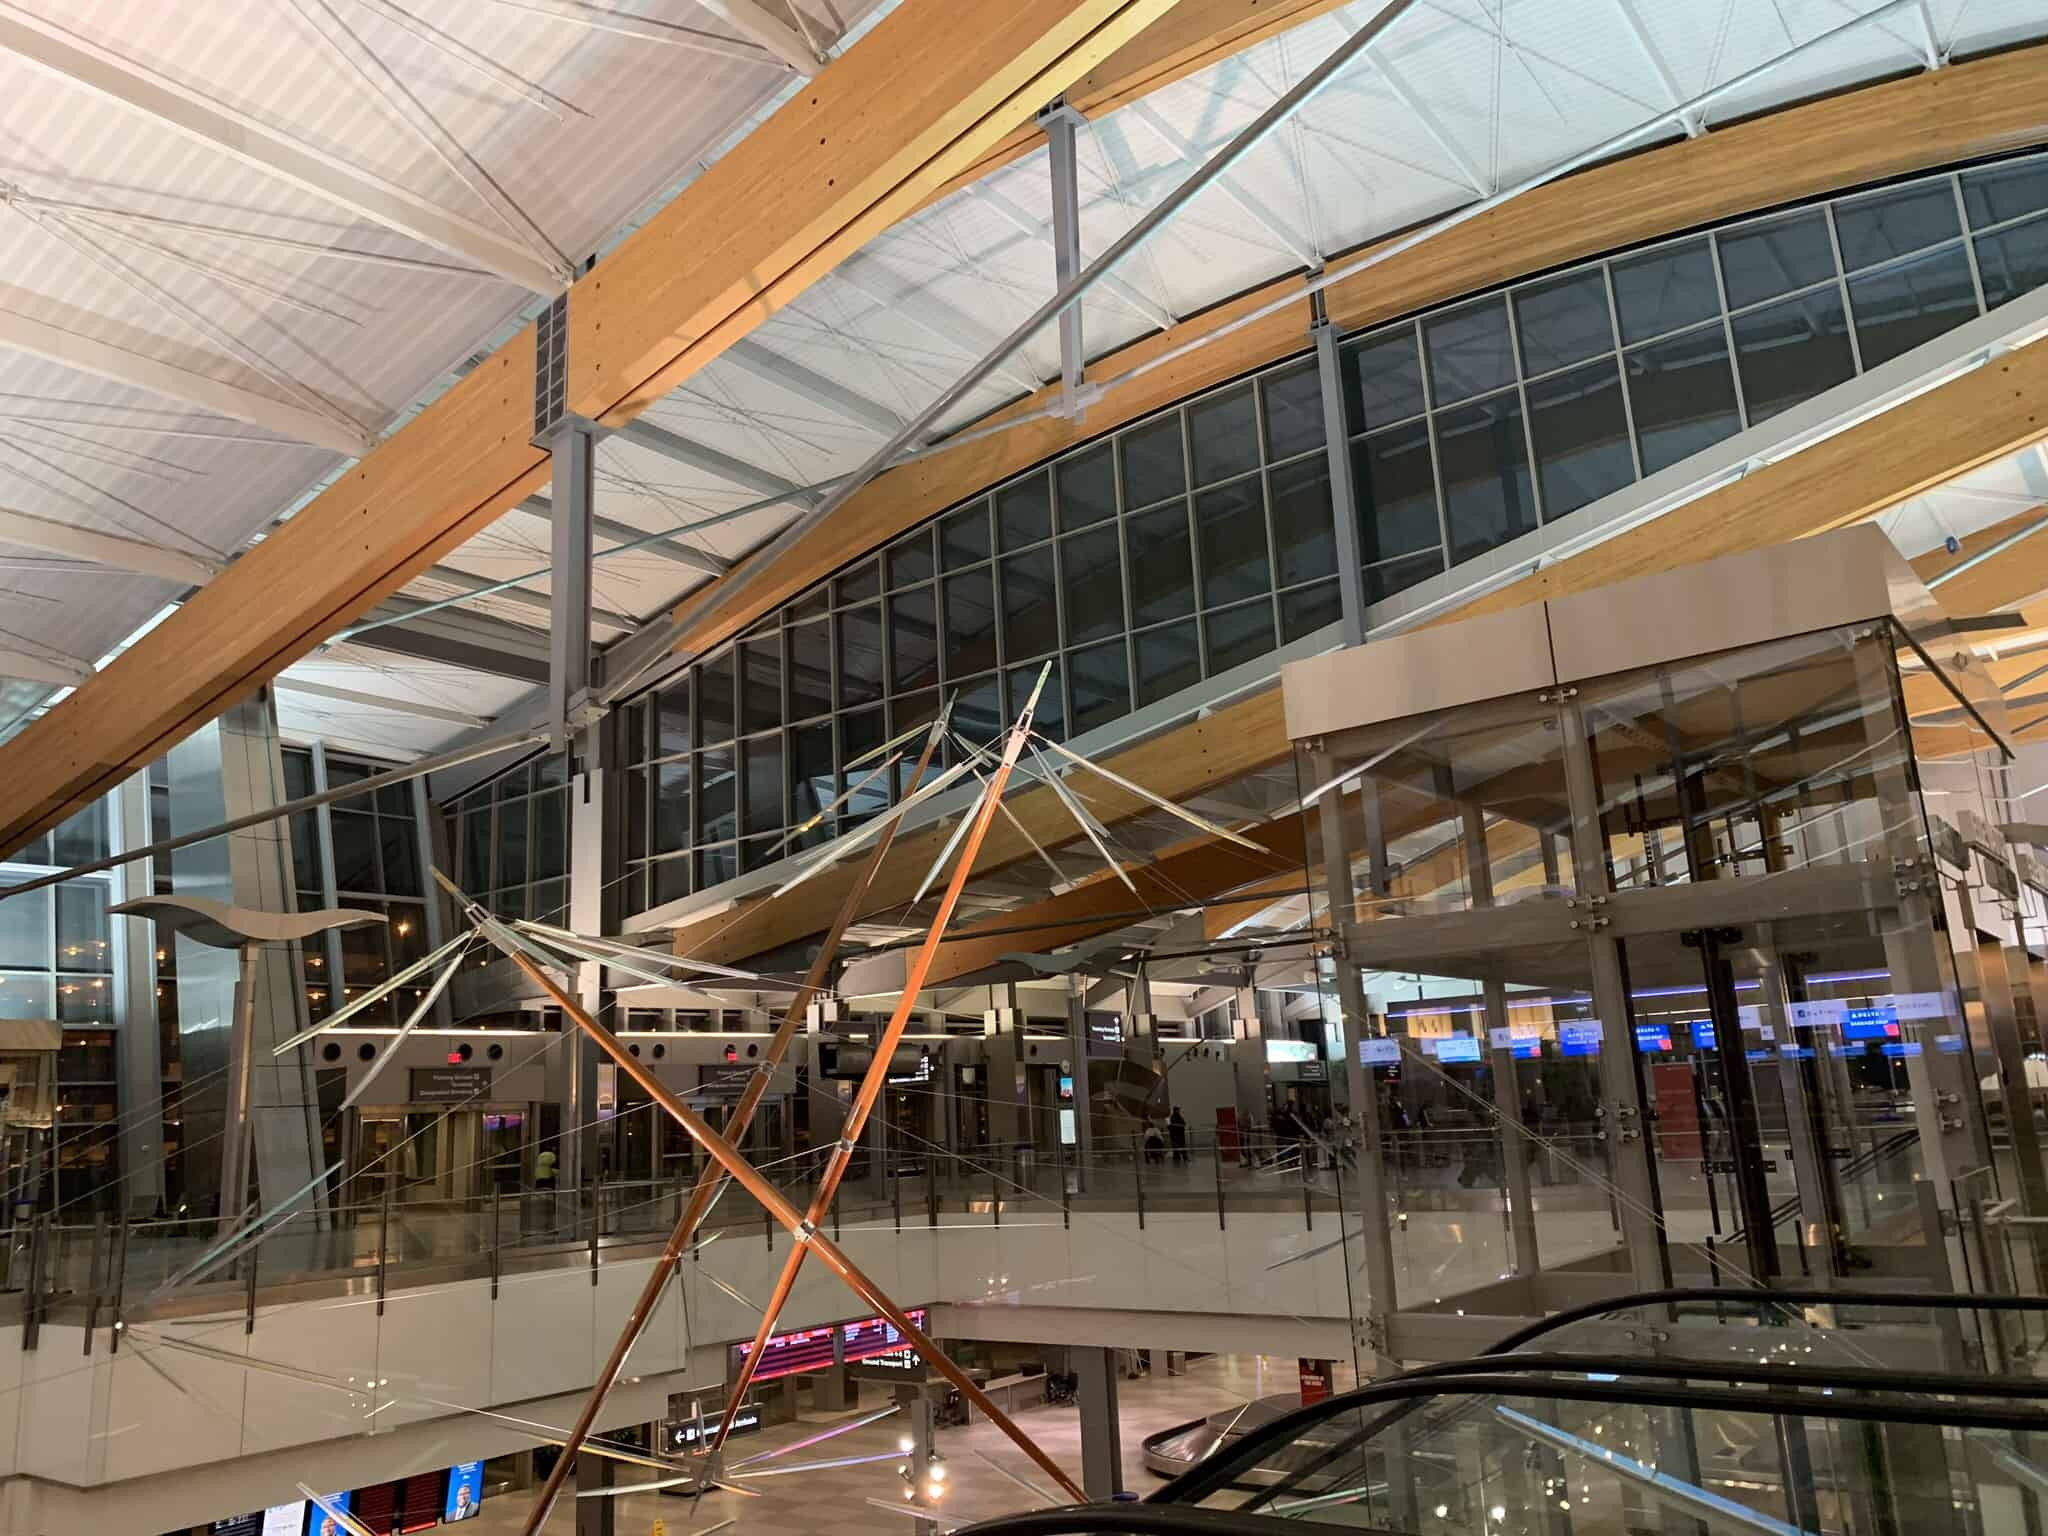 inside terminal of RDU Airport